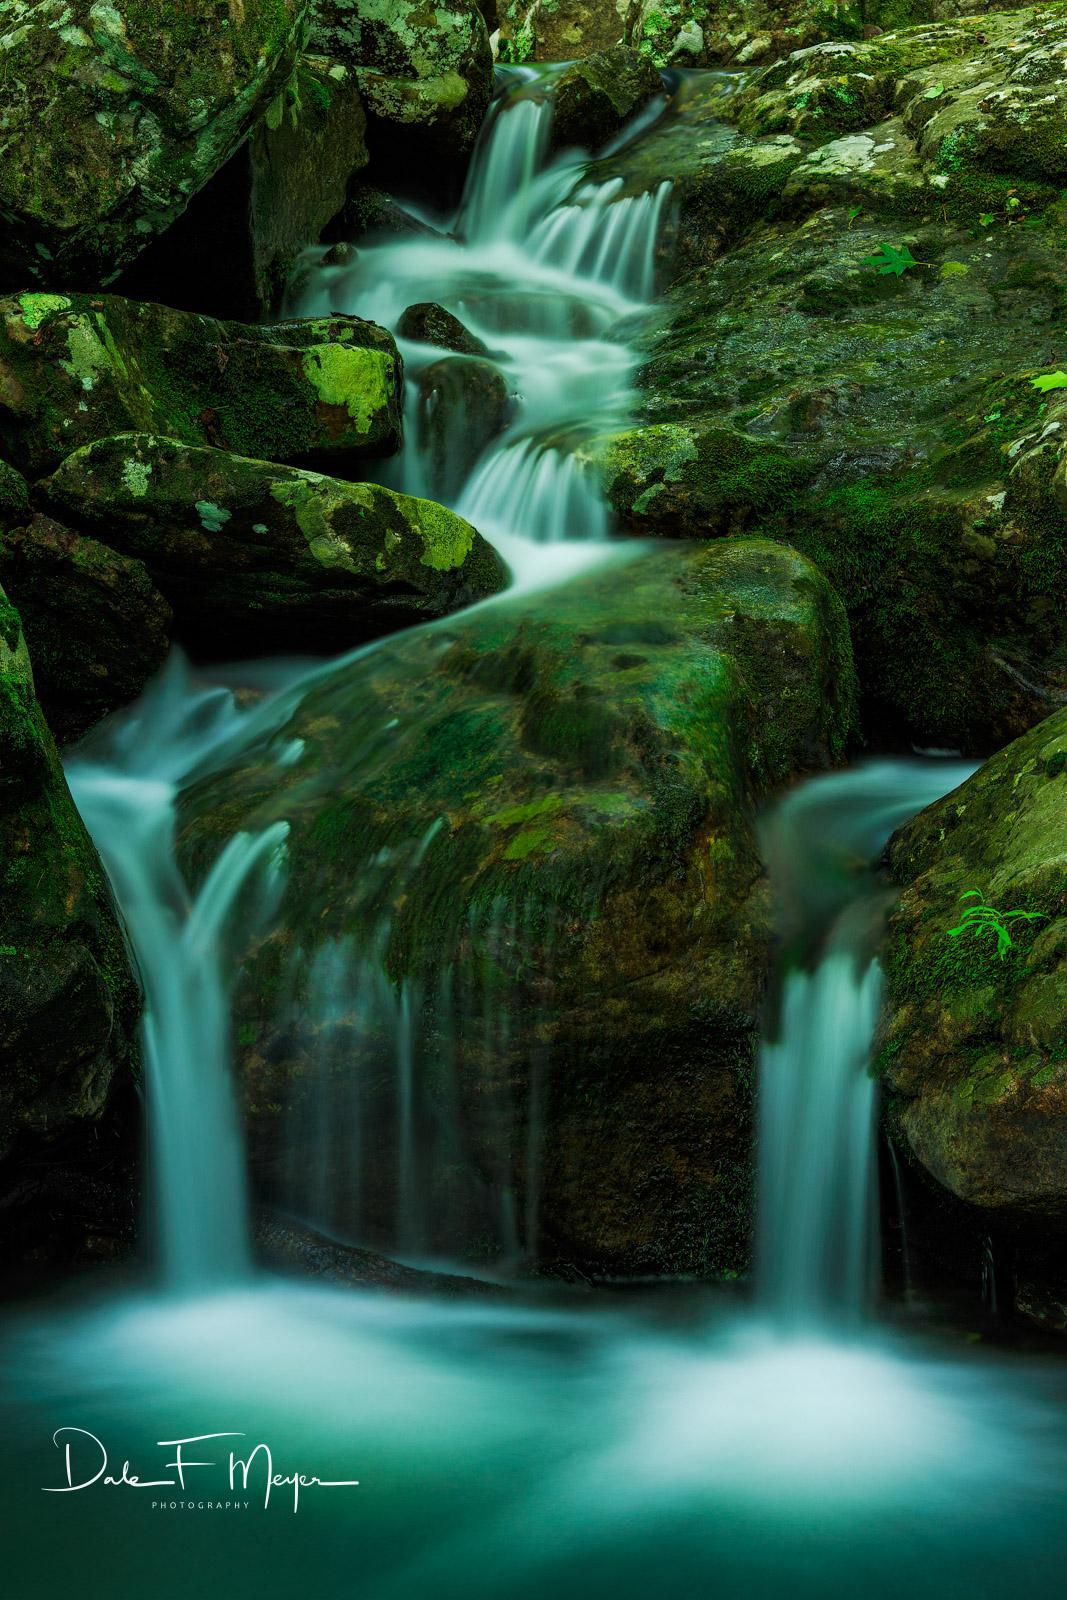 North Arkansas,falling water creek,rivers streams and waterfalls gallerie,spring,waterfall, photo